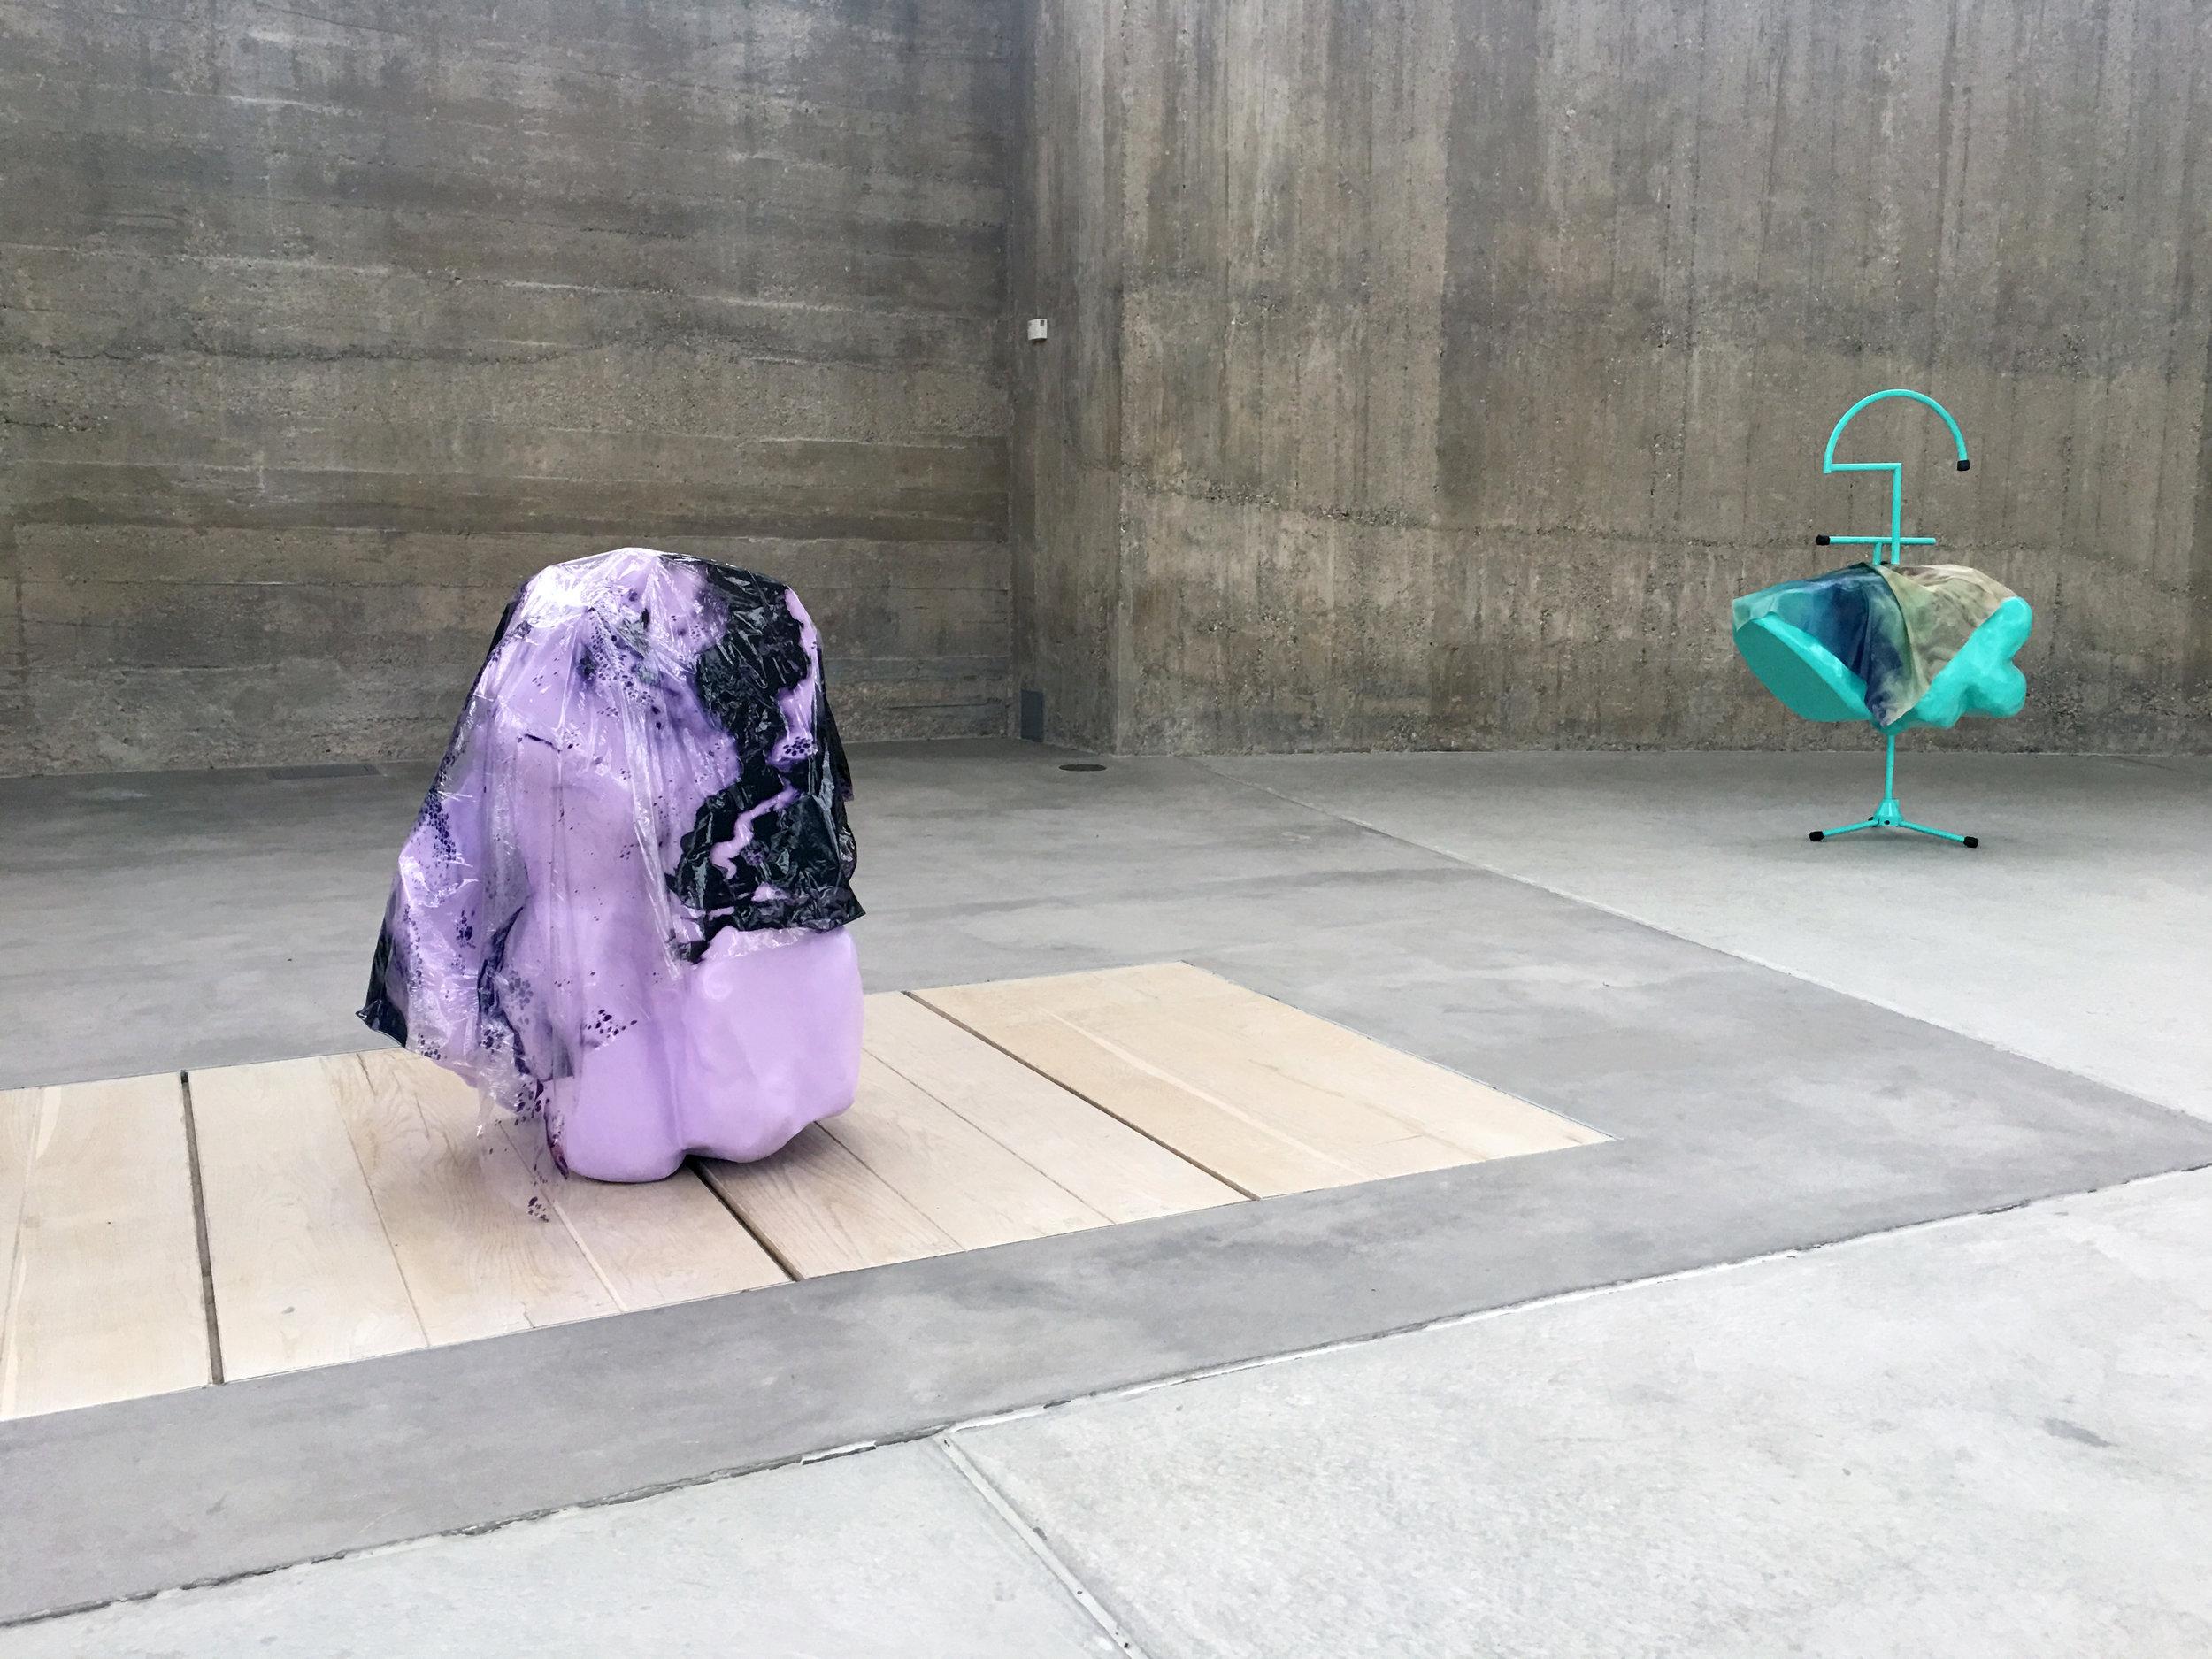 SQUABBLE ,Sculpture, 2017,91 x 70 x 64 cm,Inkjet print on plastic, polystyrene, fiberglass, paint. SNUG-FIT, Sculpture, 2017,140 x 85 x 47 cm,Inkjet print on latex, polystyrene, fiberglass, paint, metal, rubber